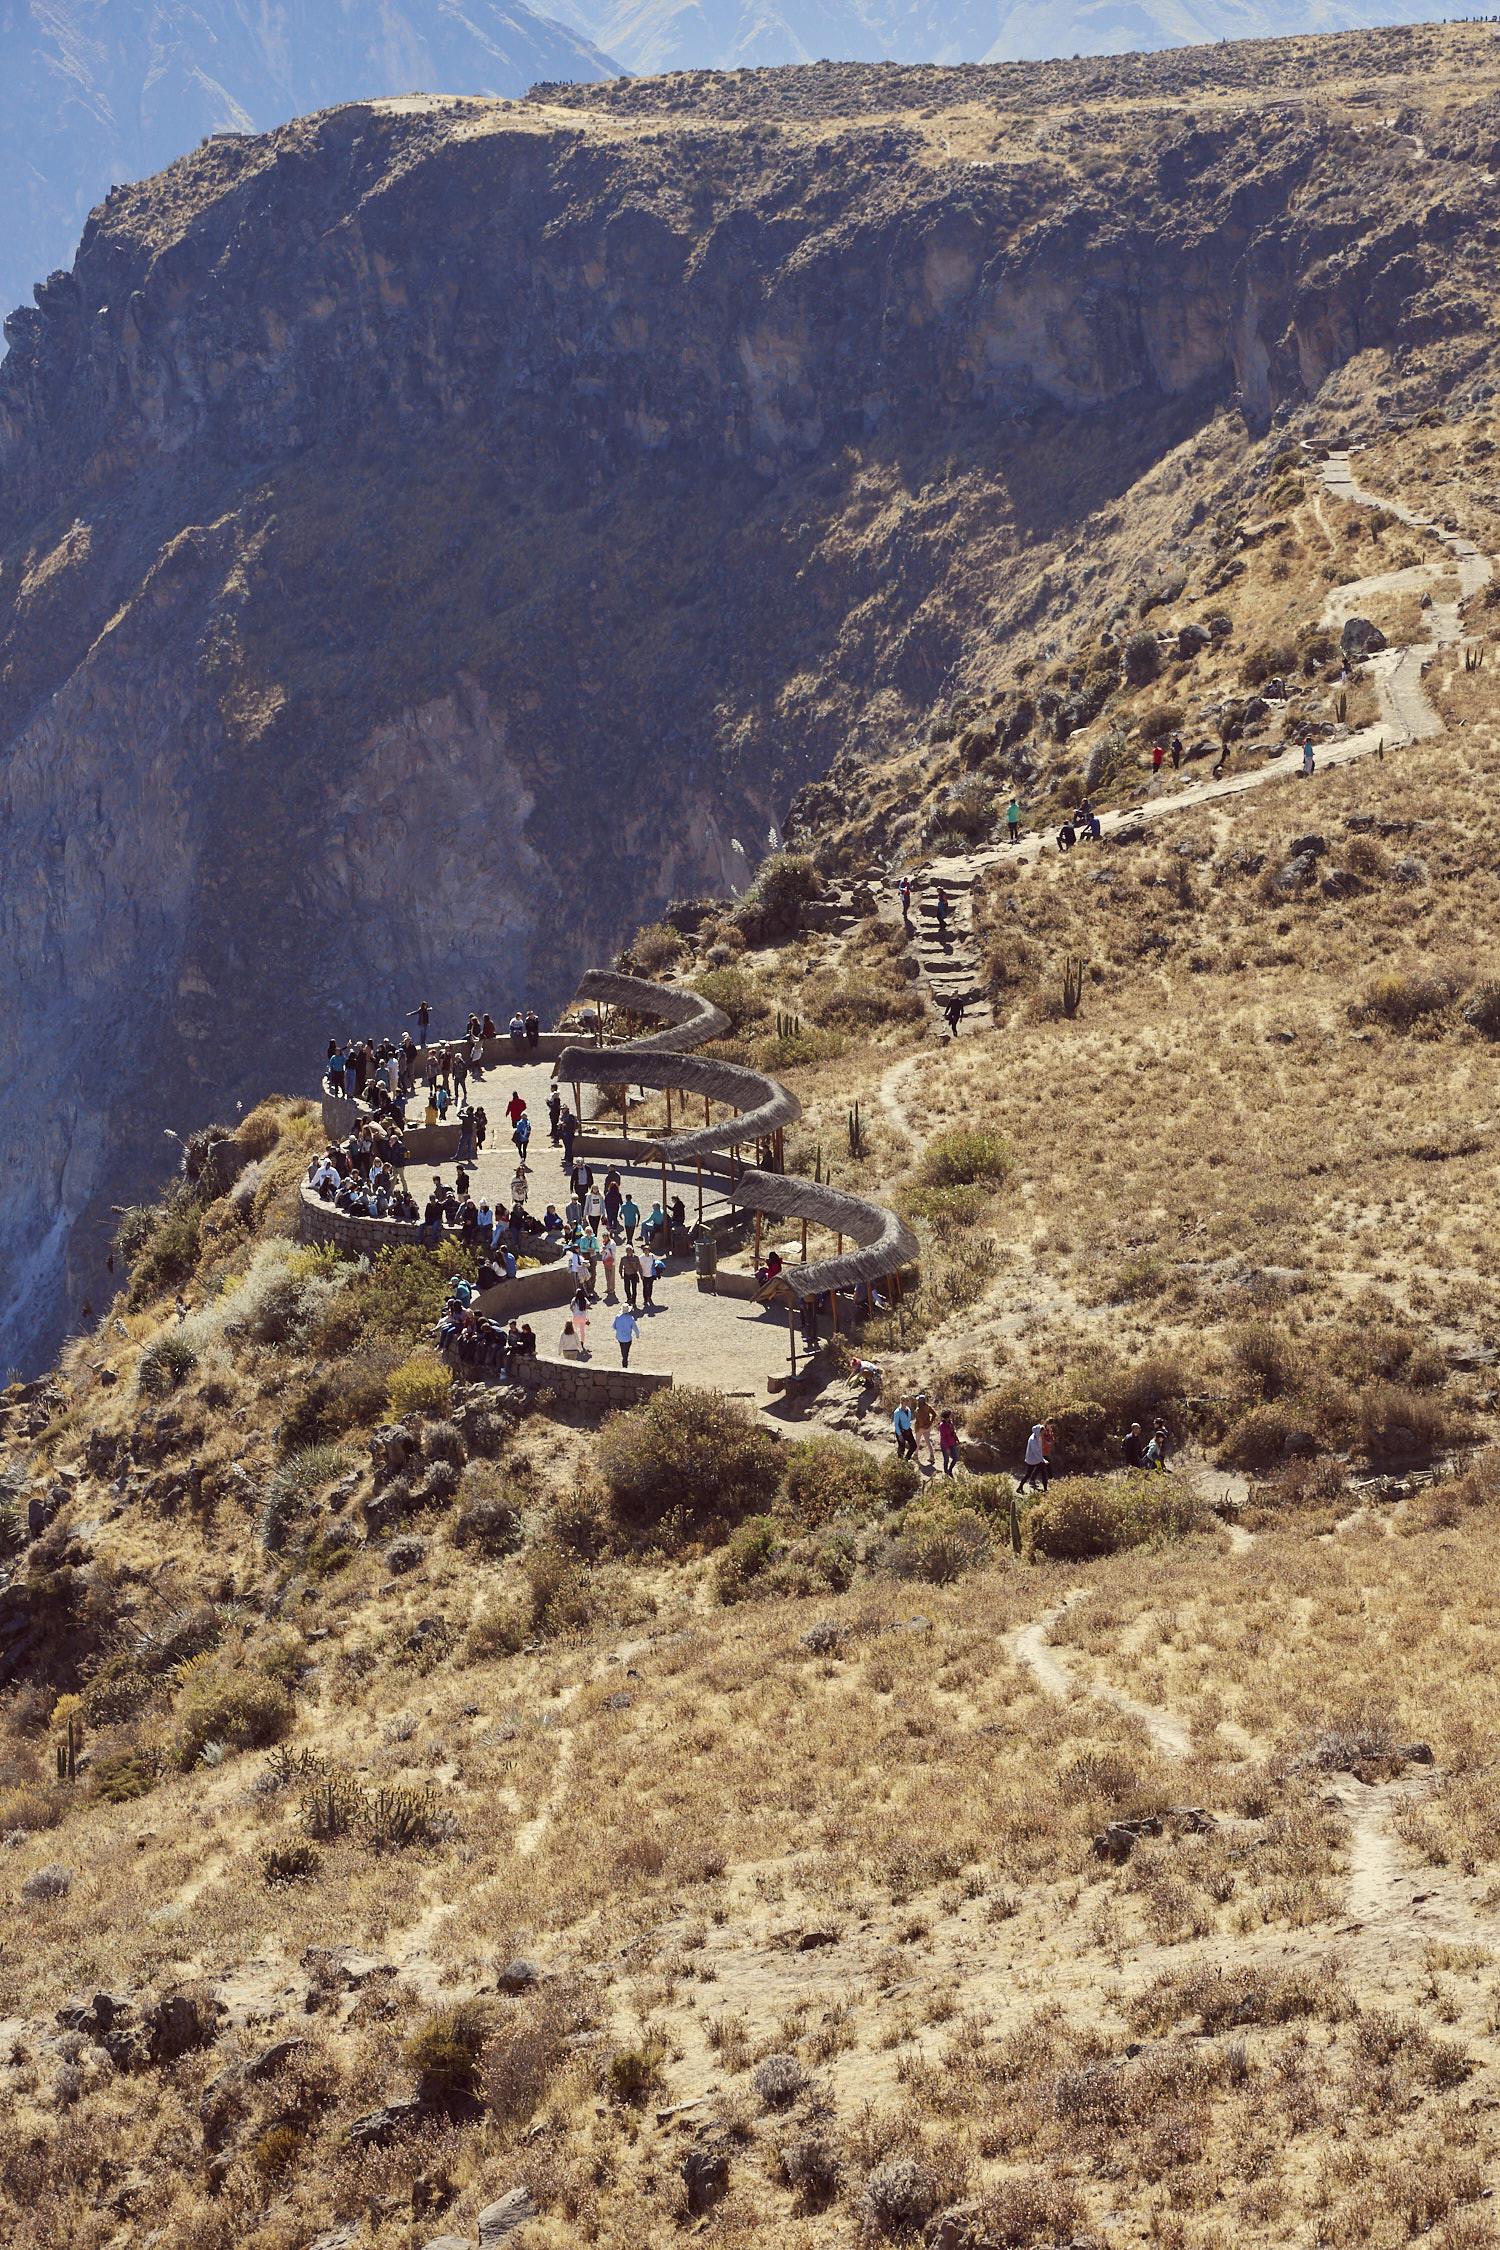 Die untere Plattform beim Cruz del Conodor beim Colca Canyon in Peru